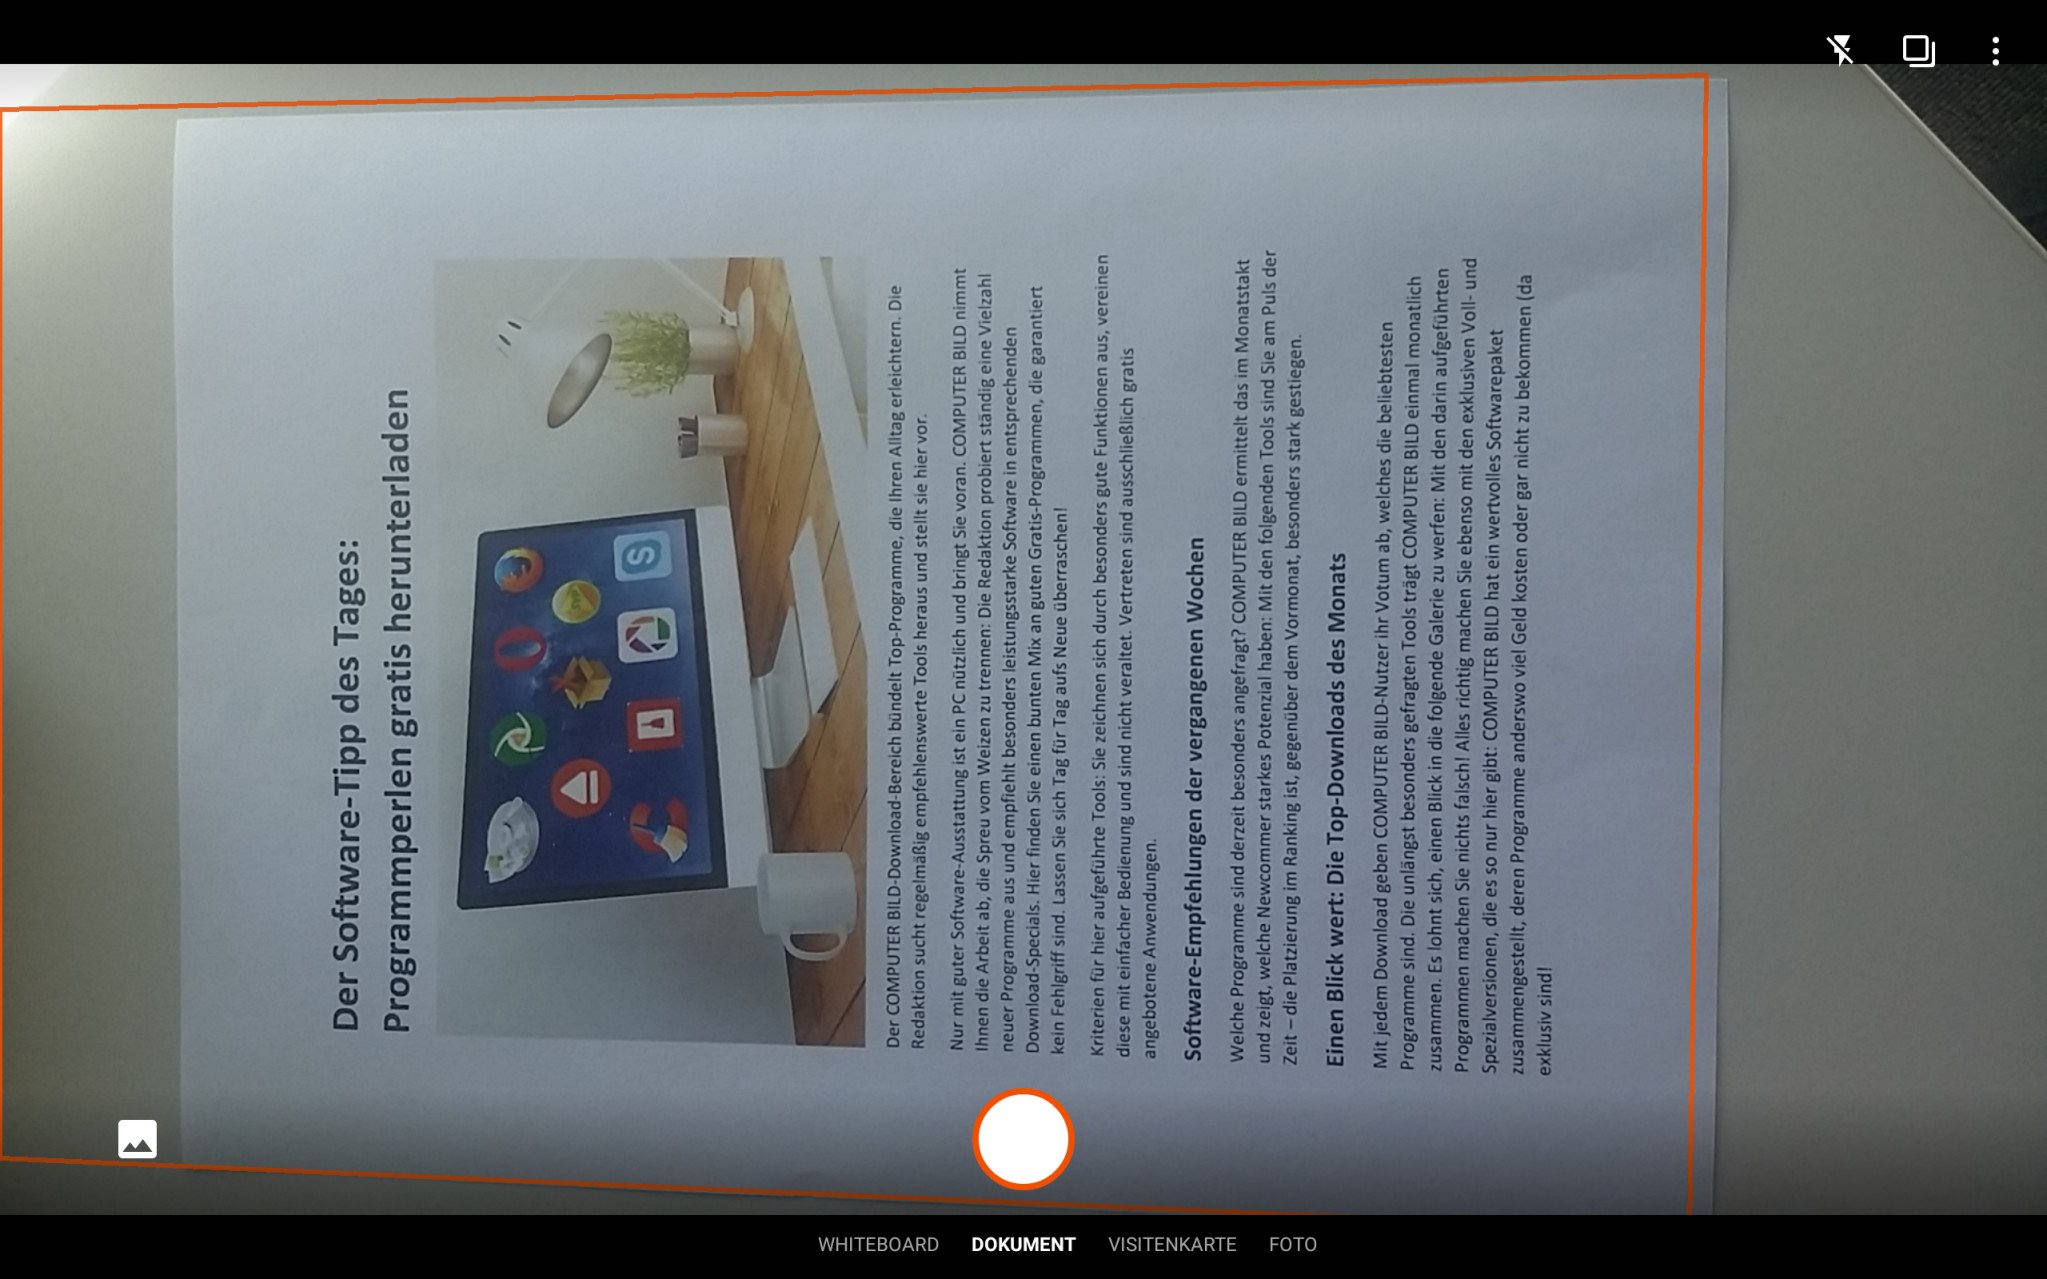 Screenshot 1 - Microsoft Office Lens (App für iPhone & iPad)